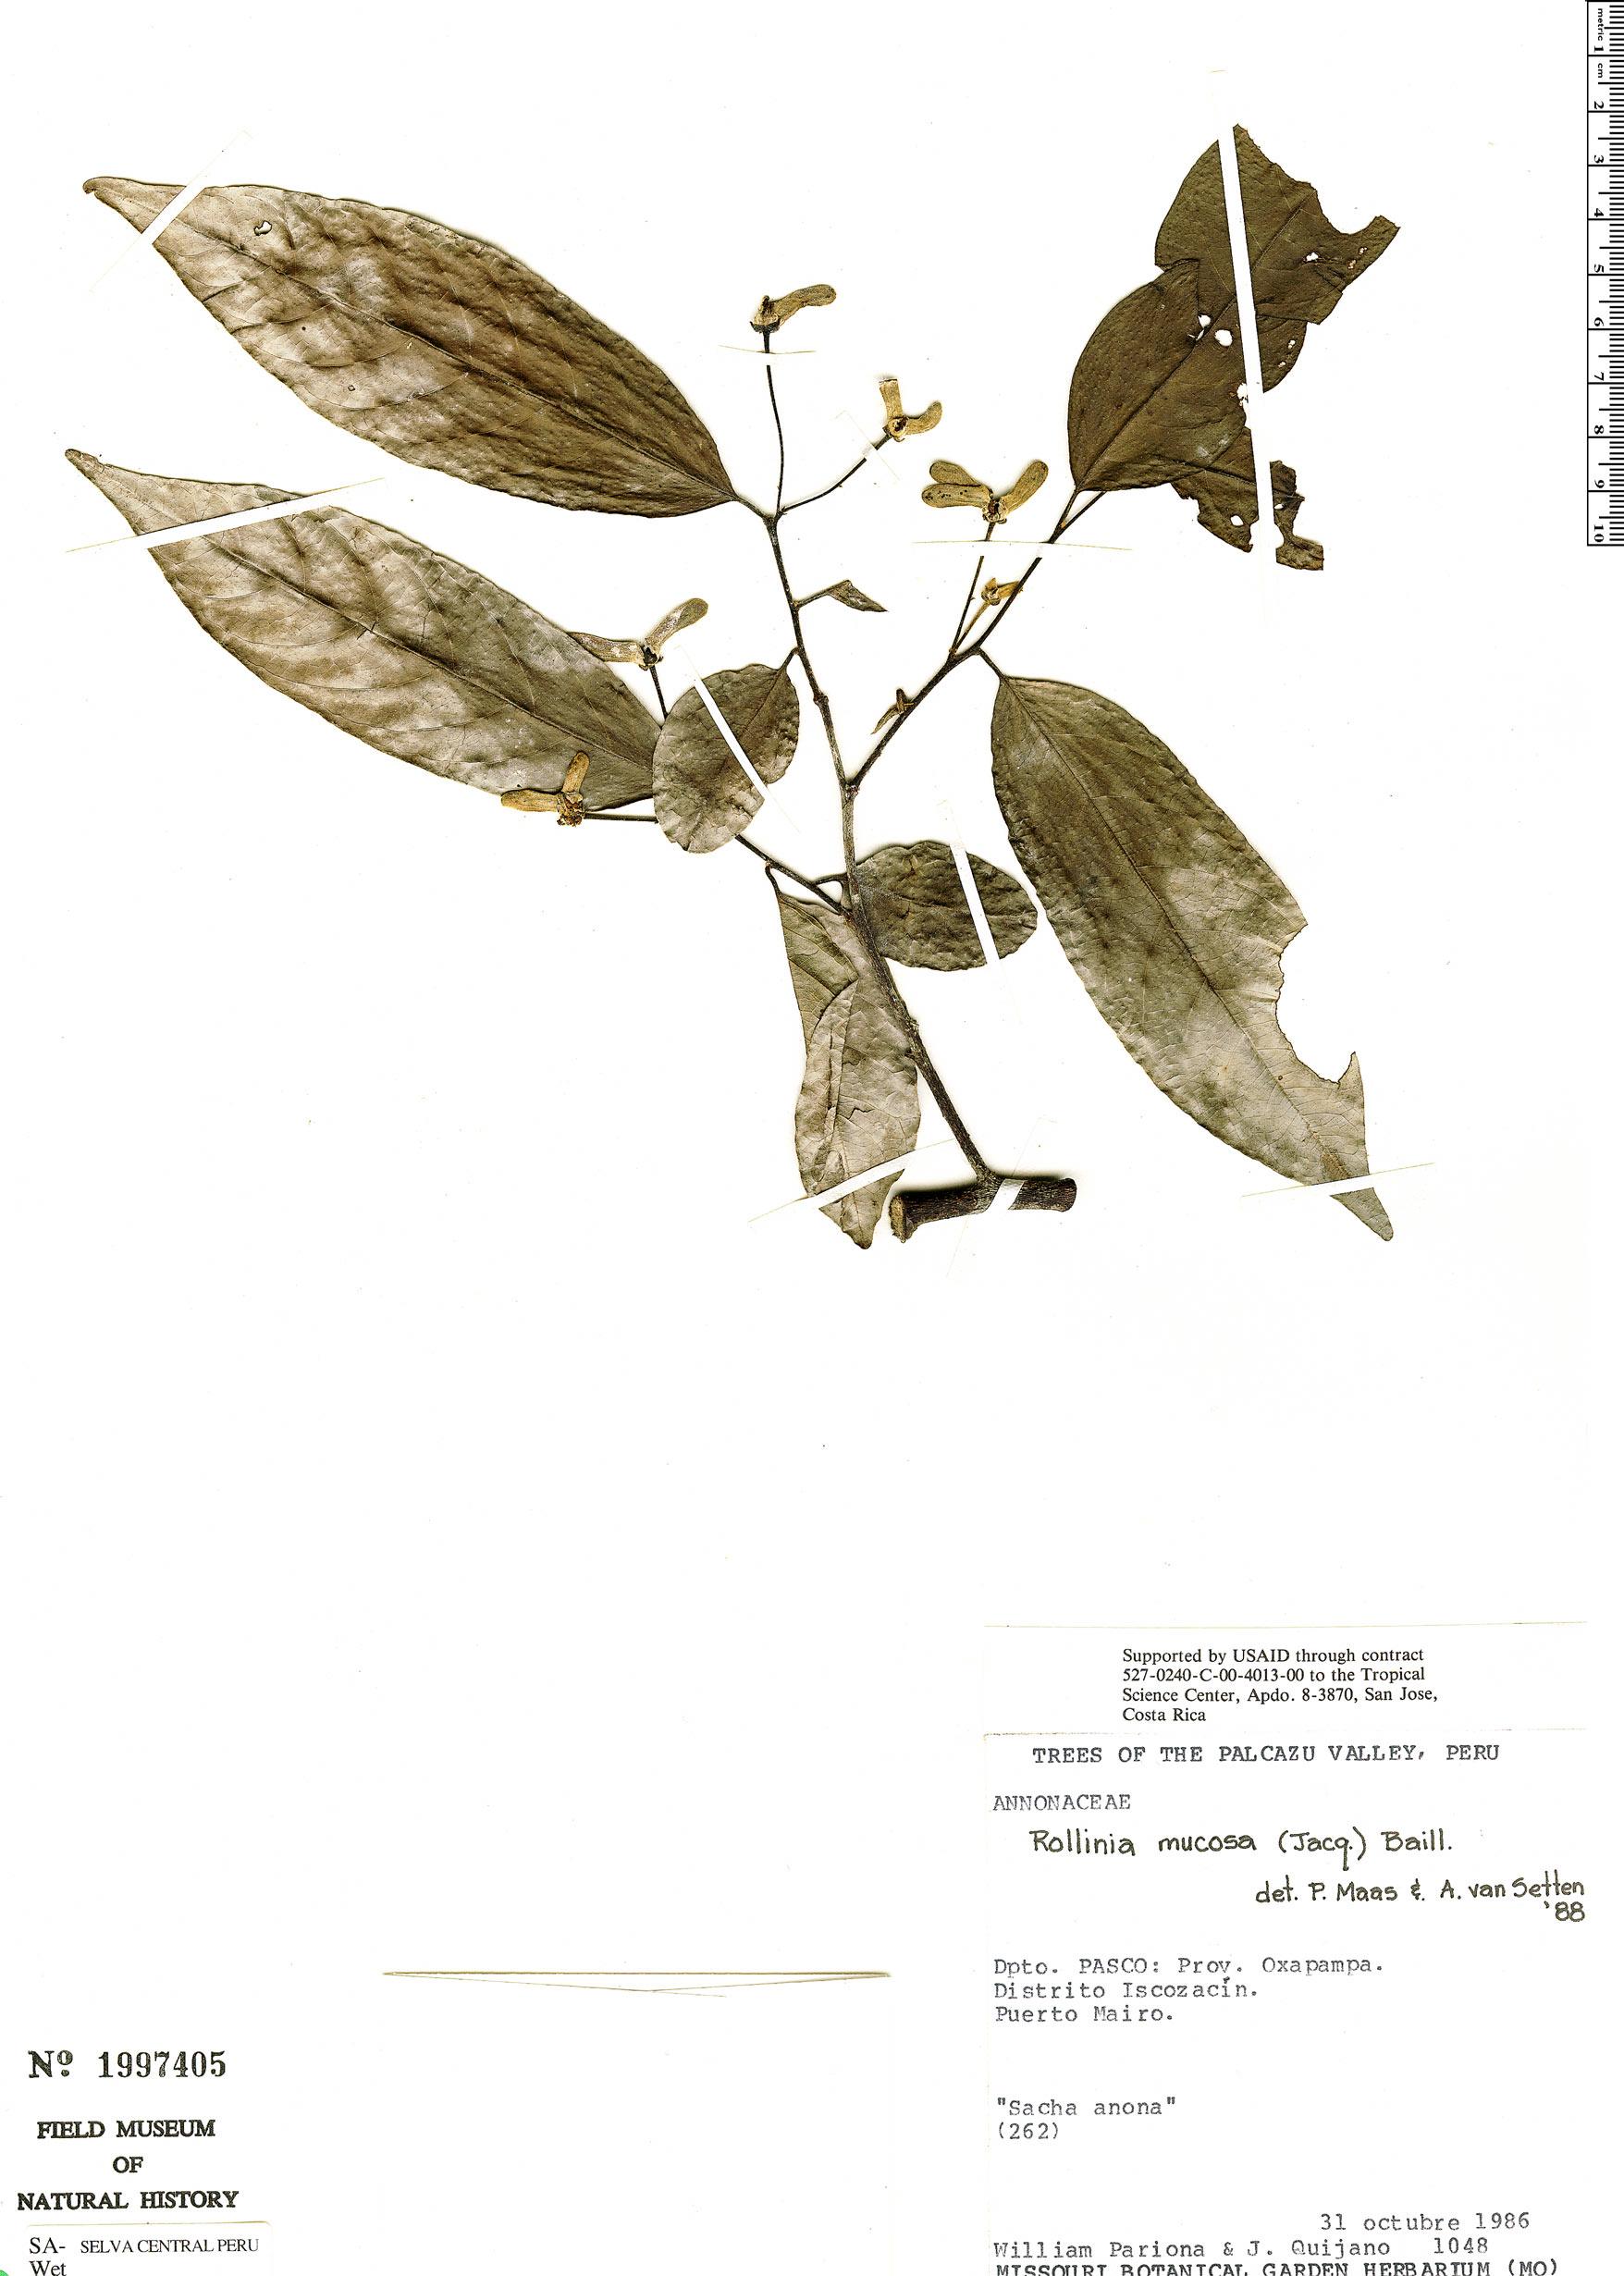 Specimen: Annona mucosa